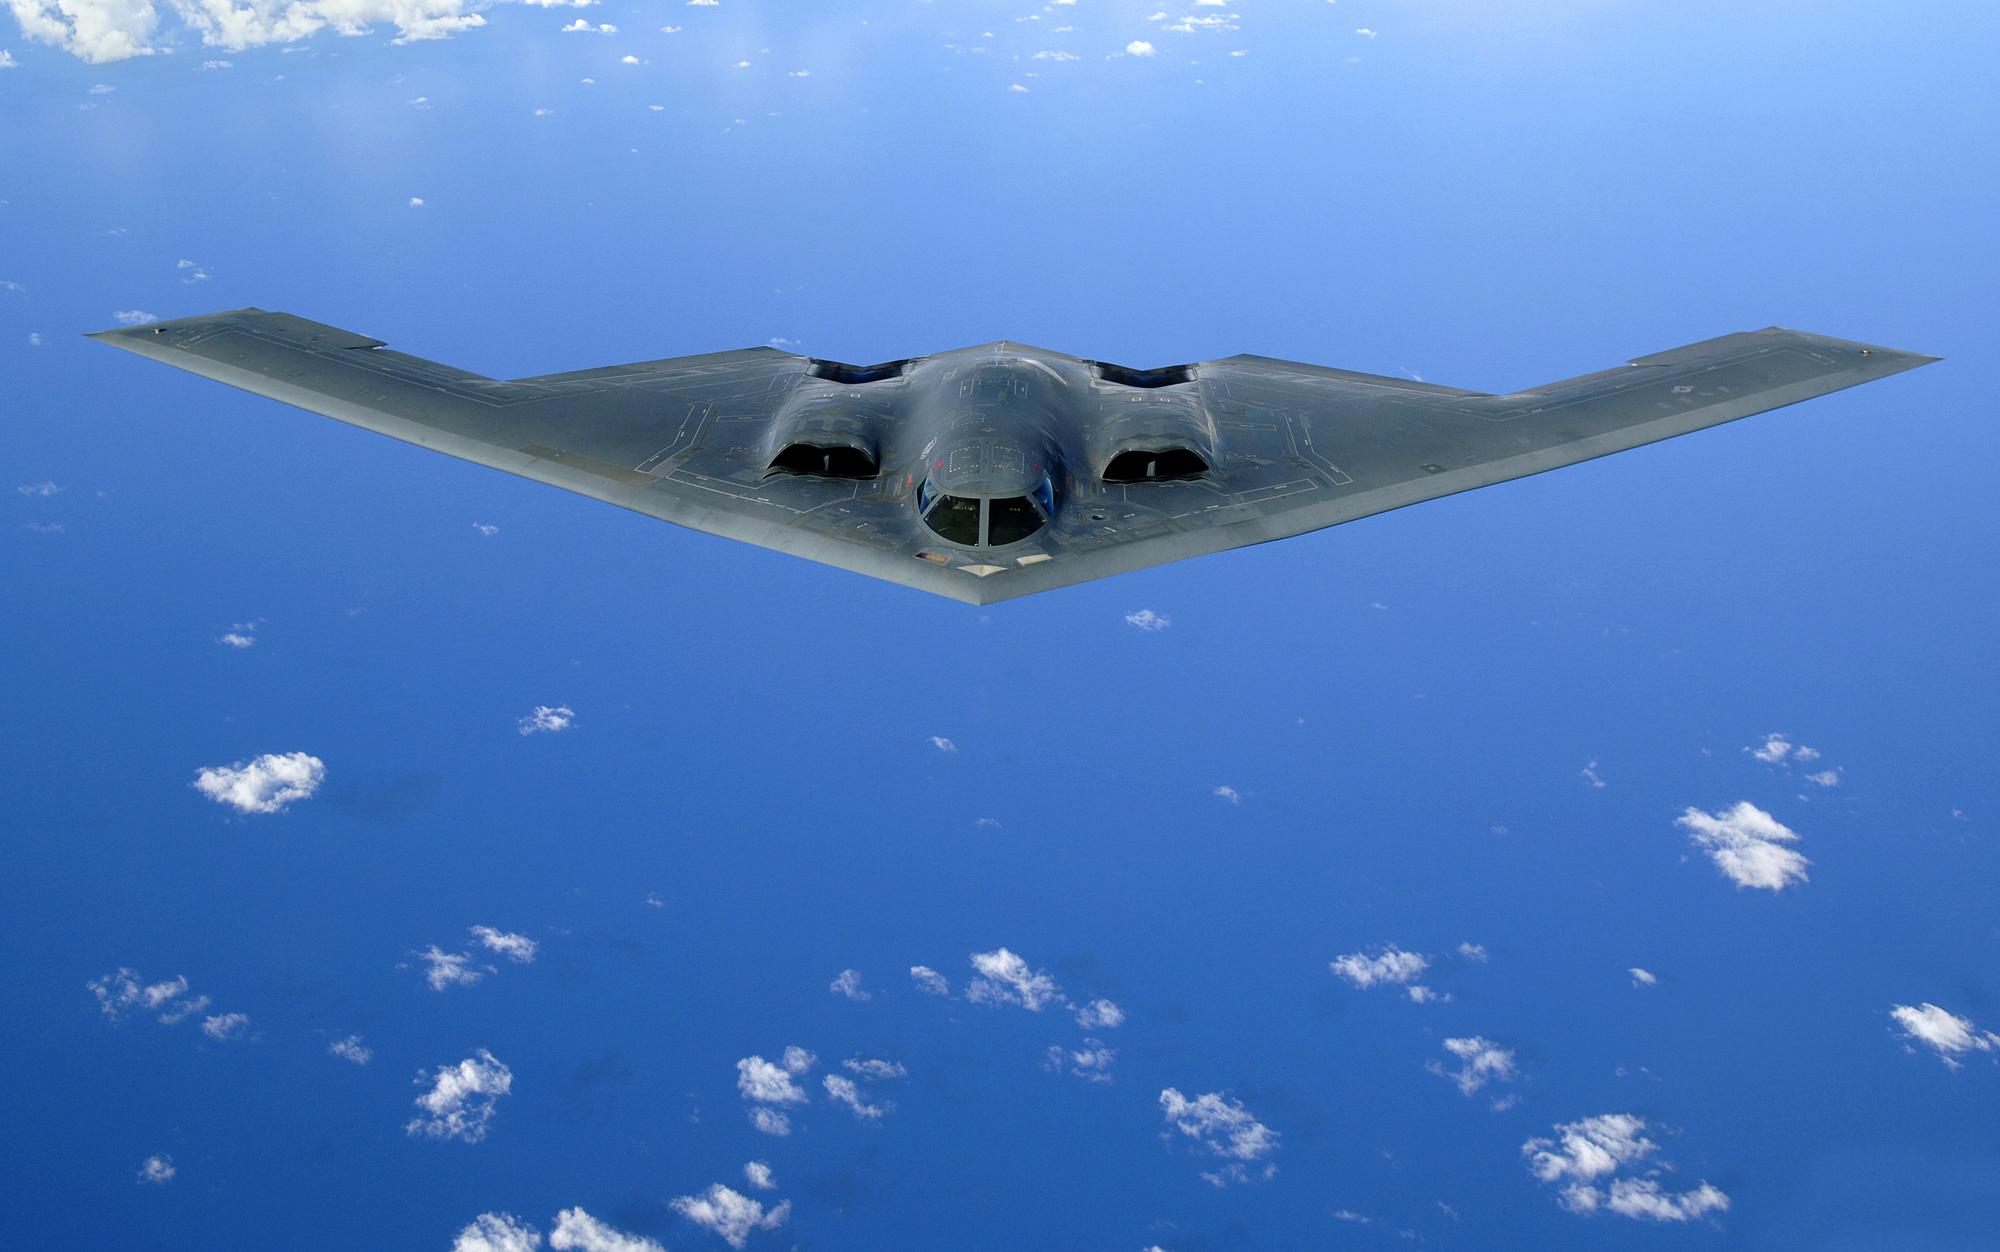 Northrop Grumman B 2 Spirit HD Wallpaper Background Image 2000x1252